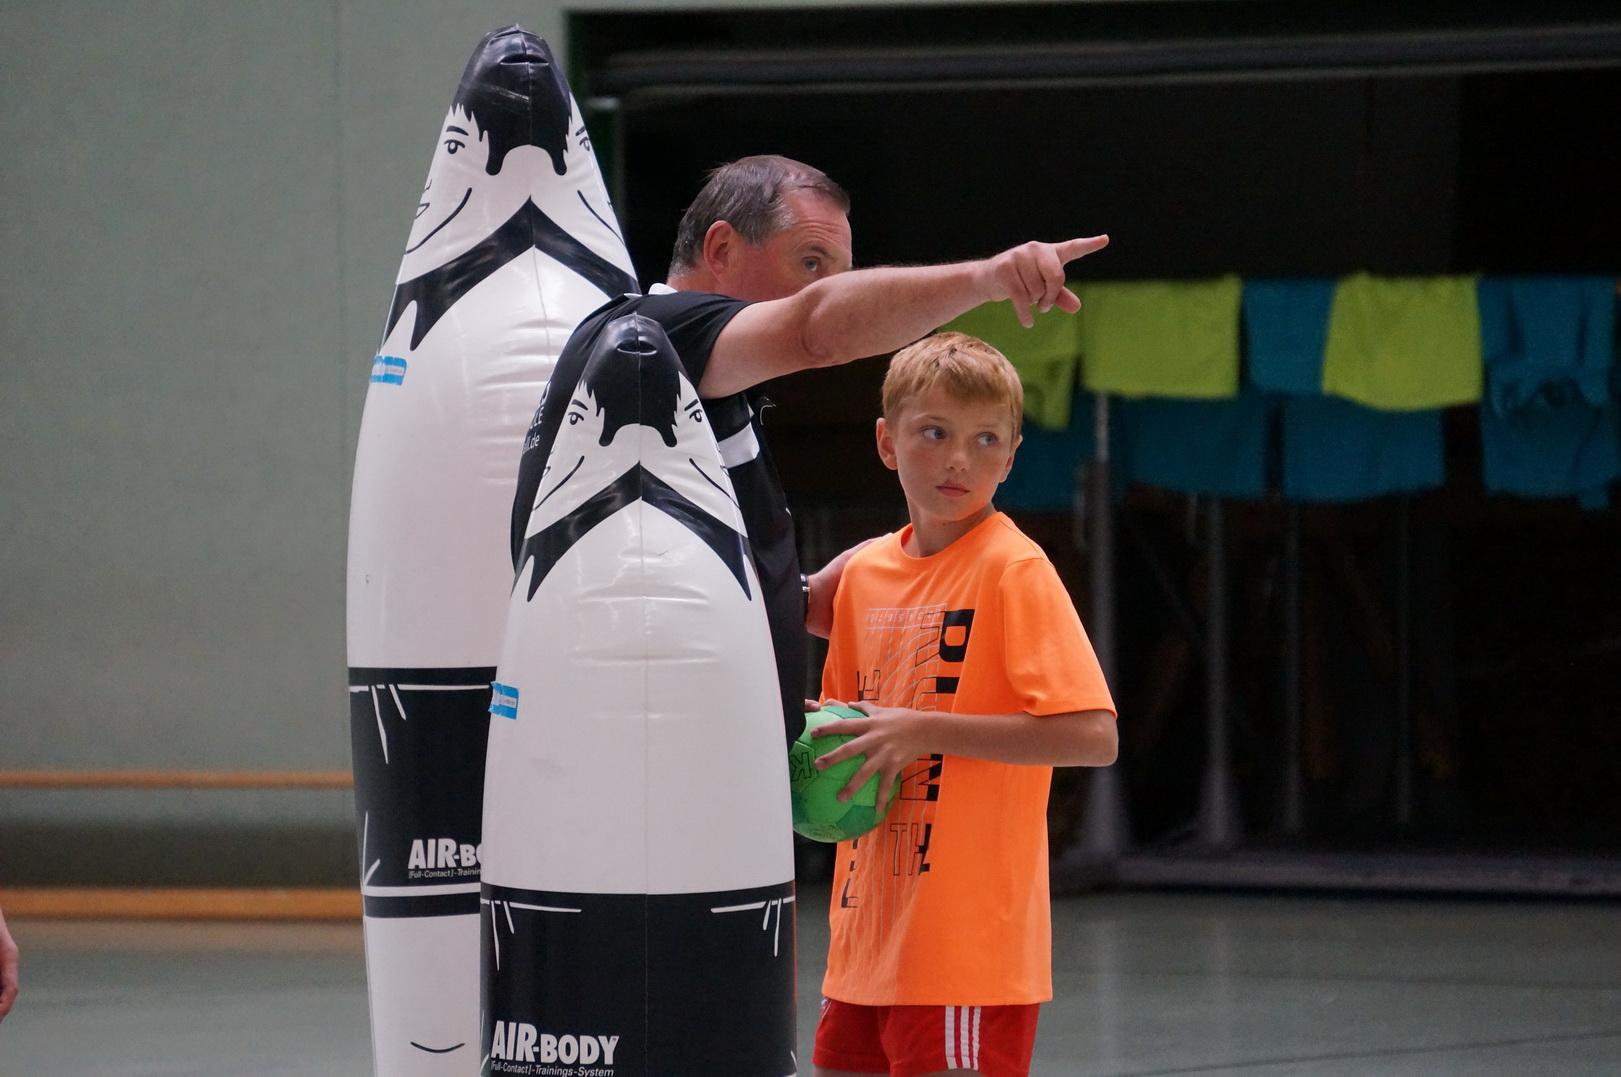 201808_Handballcamp_SDH_MG_219w